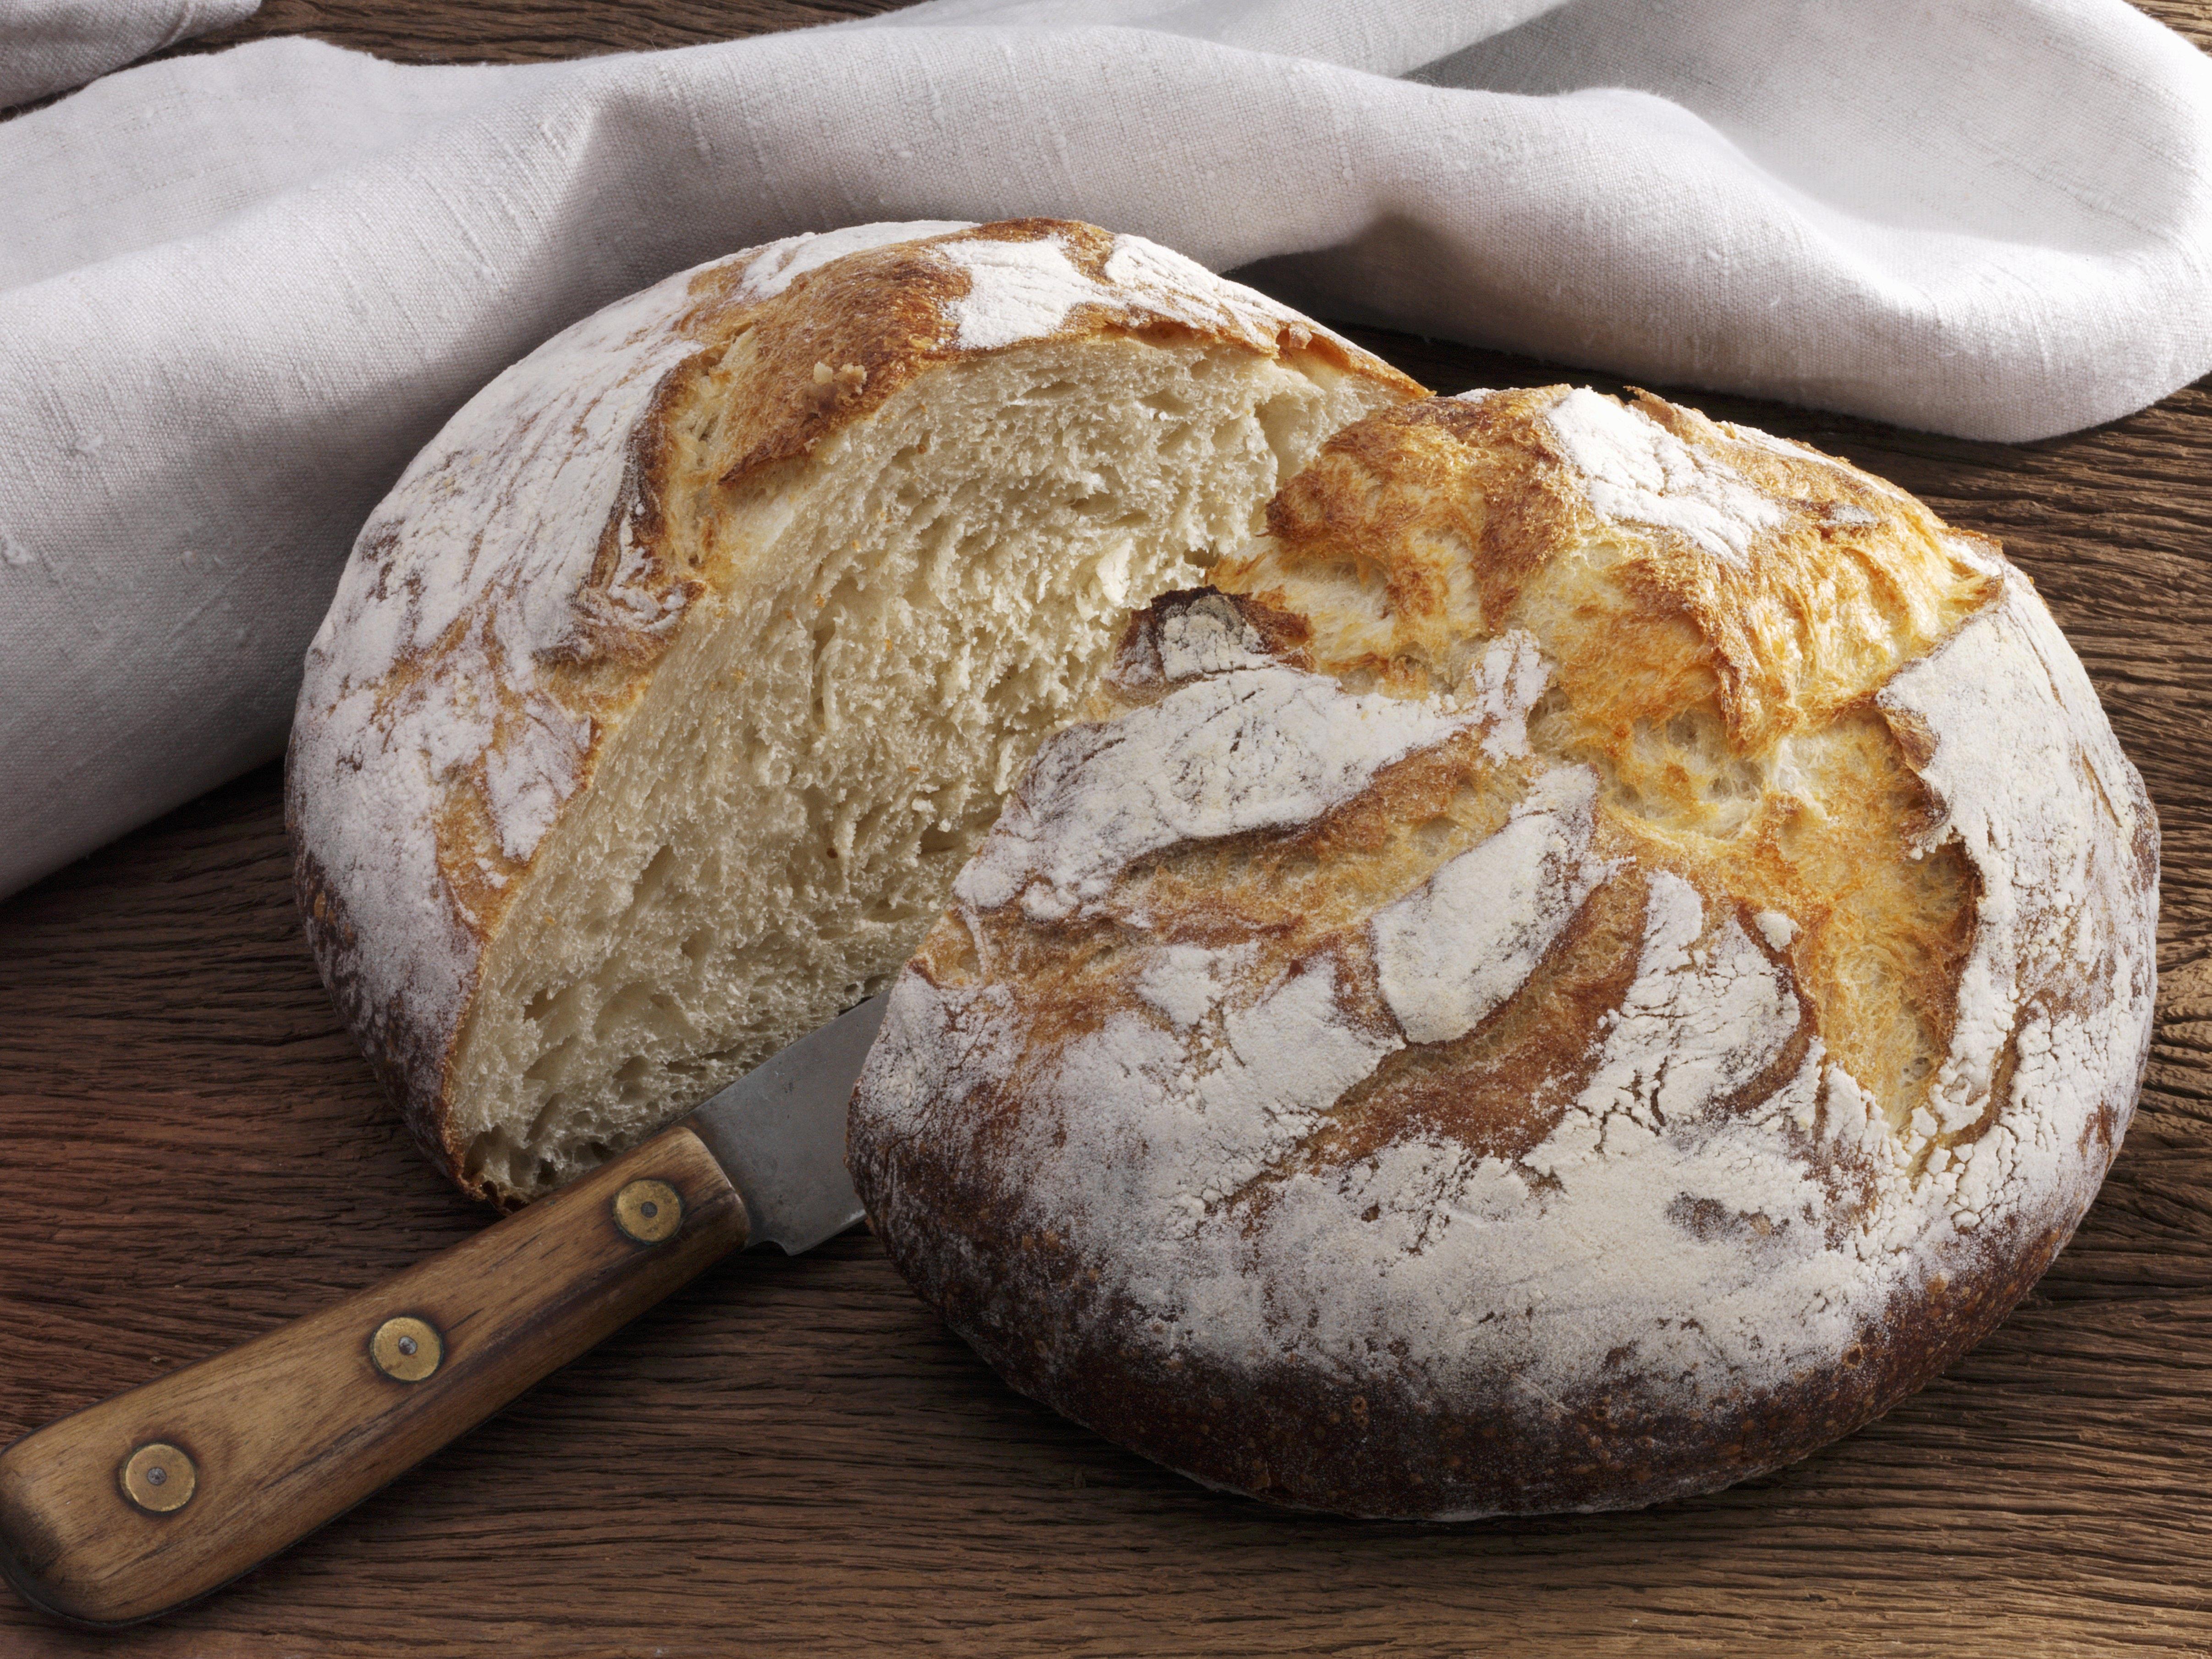 Buttermilk bread, sliced in half